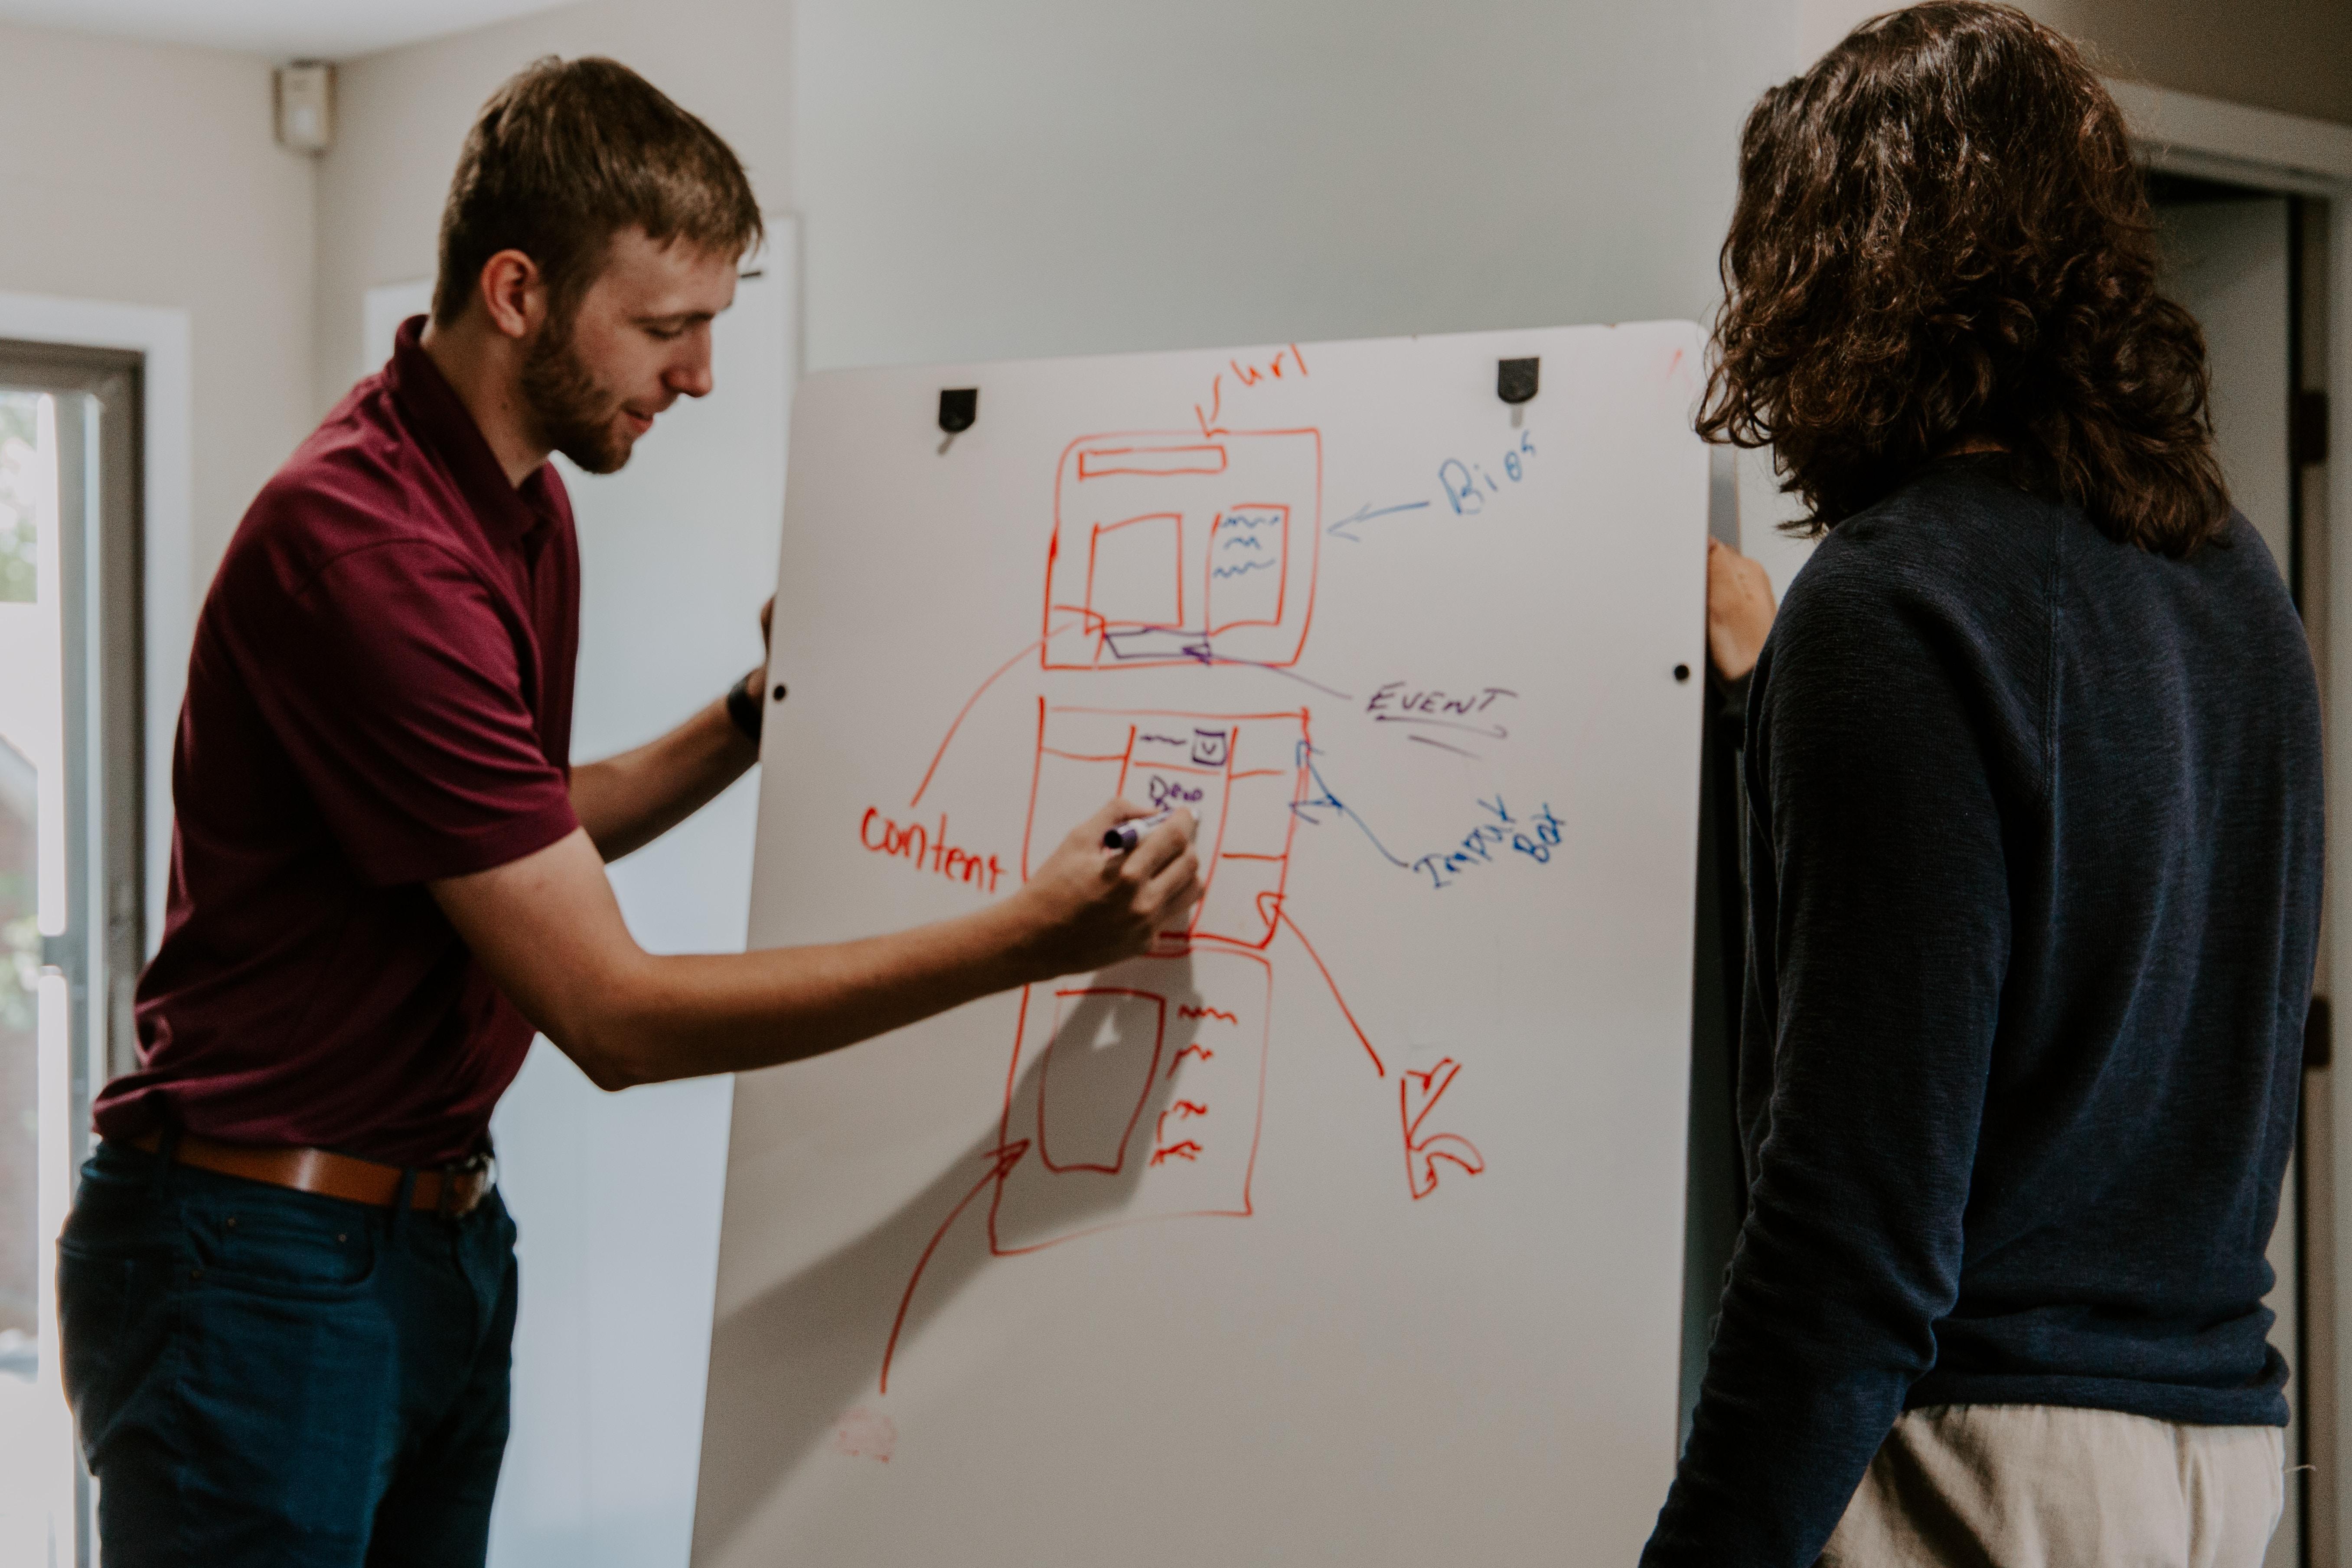 5 ways SME can improve their marketing